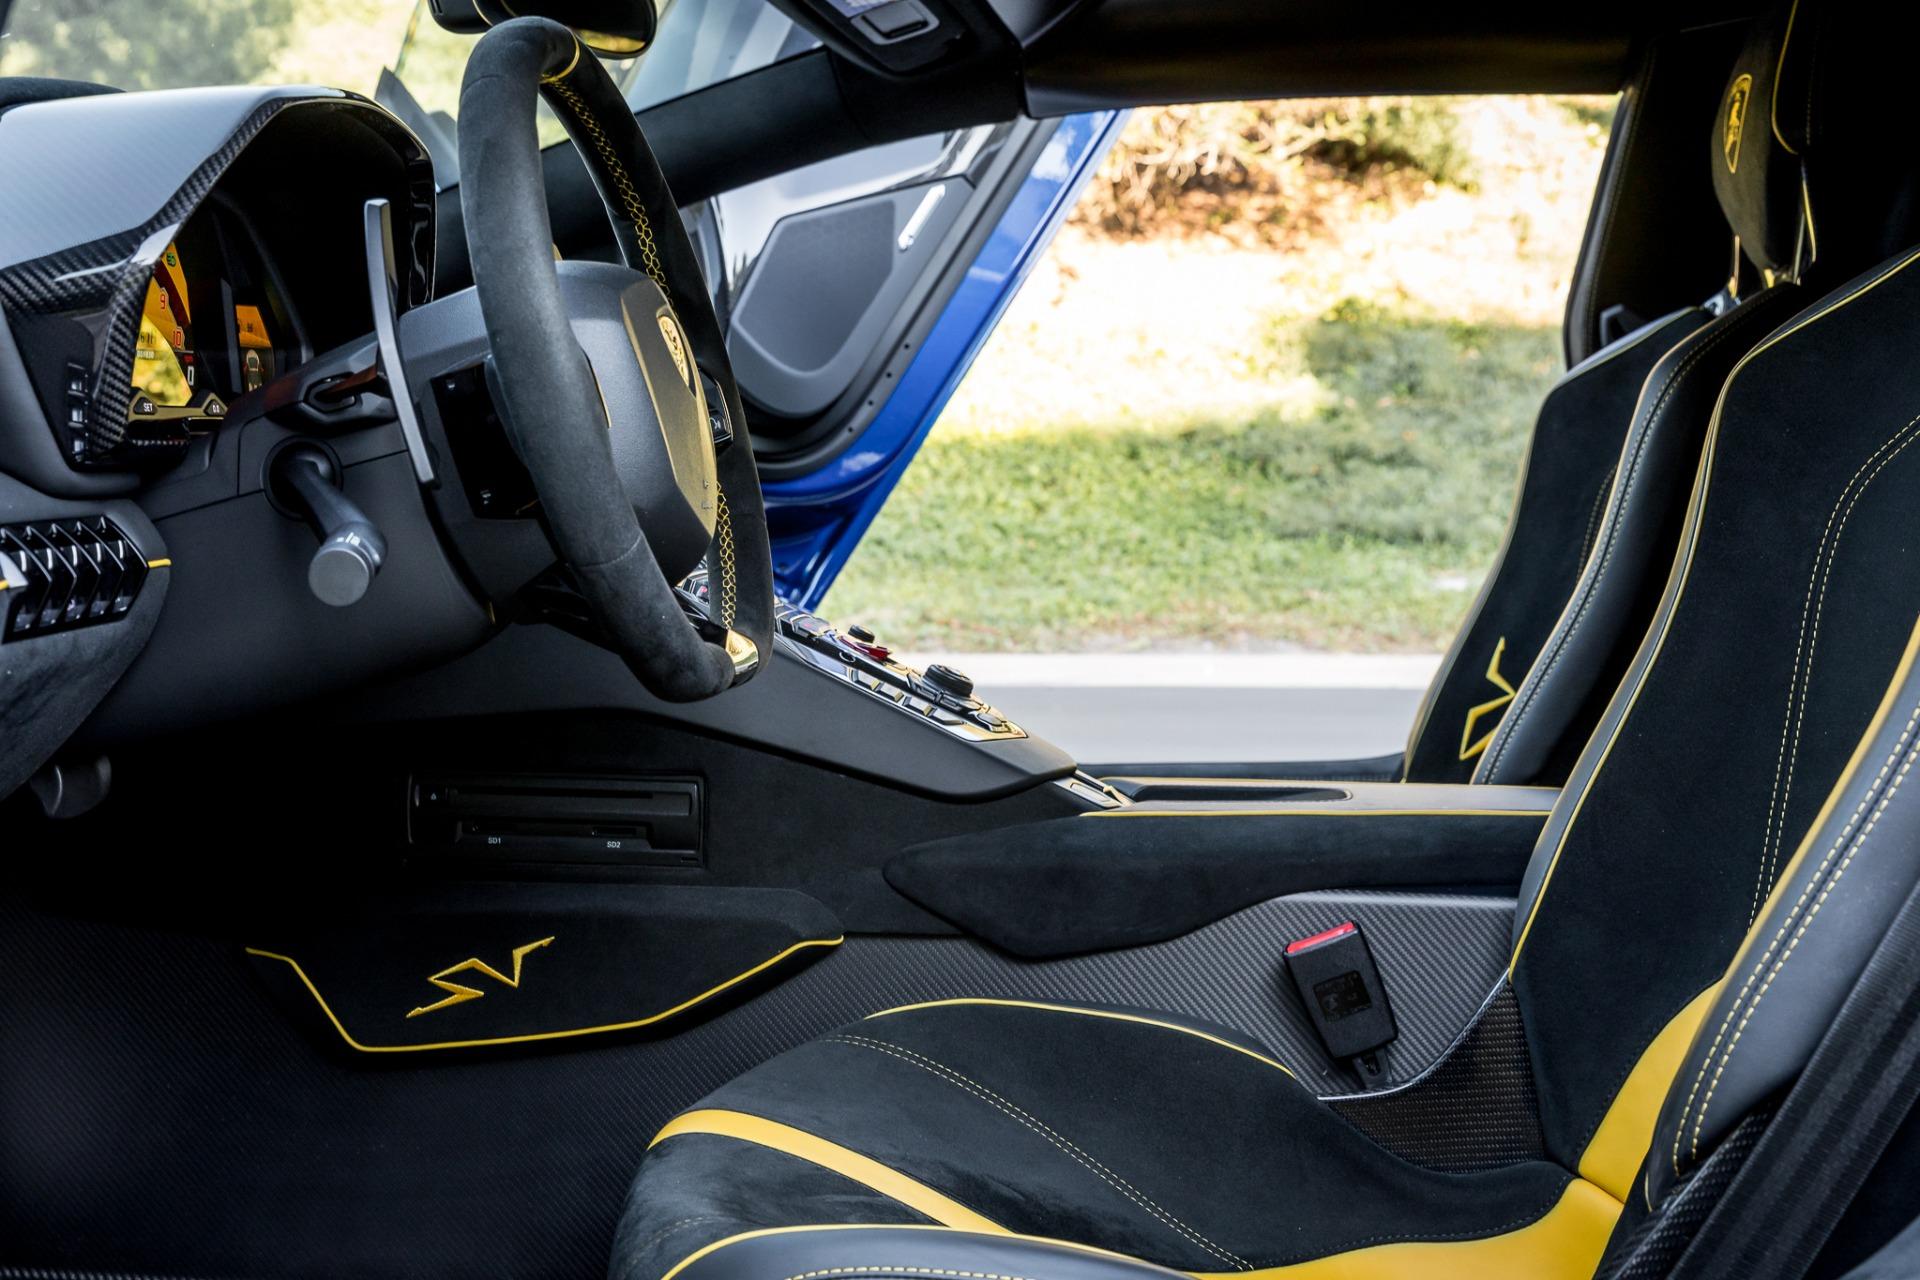 Used 2017 Lamborghini Aventador LP 750-4 SV / 740HP / AWD / 1930 MI / NAV / CAMERA for sale Sold at Formula Imports in Charlotte NC 28227 55